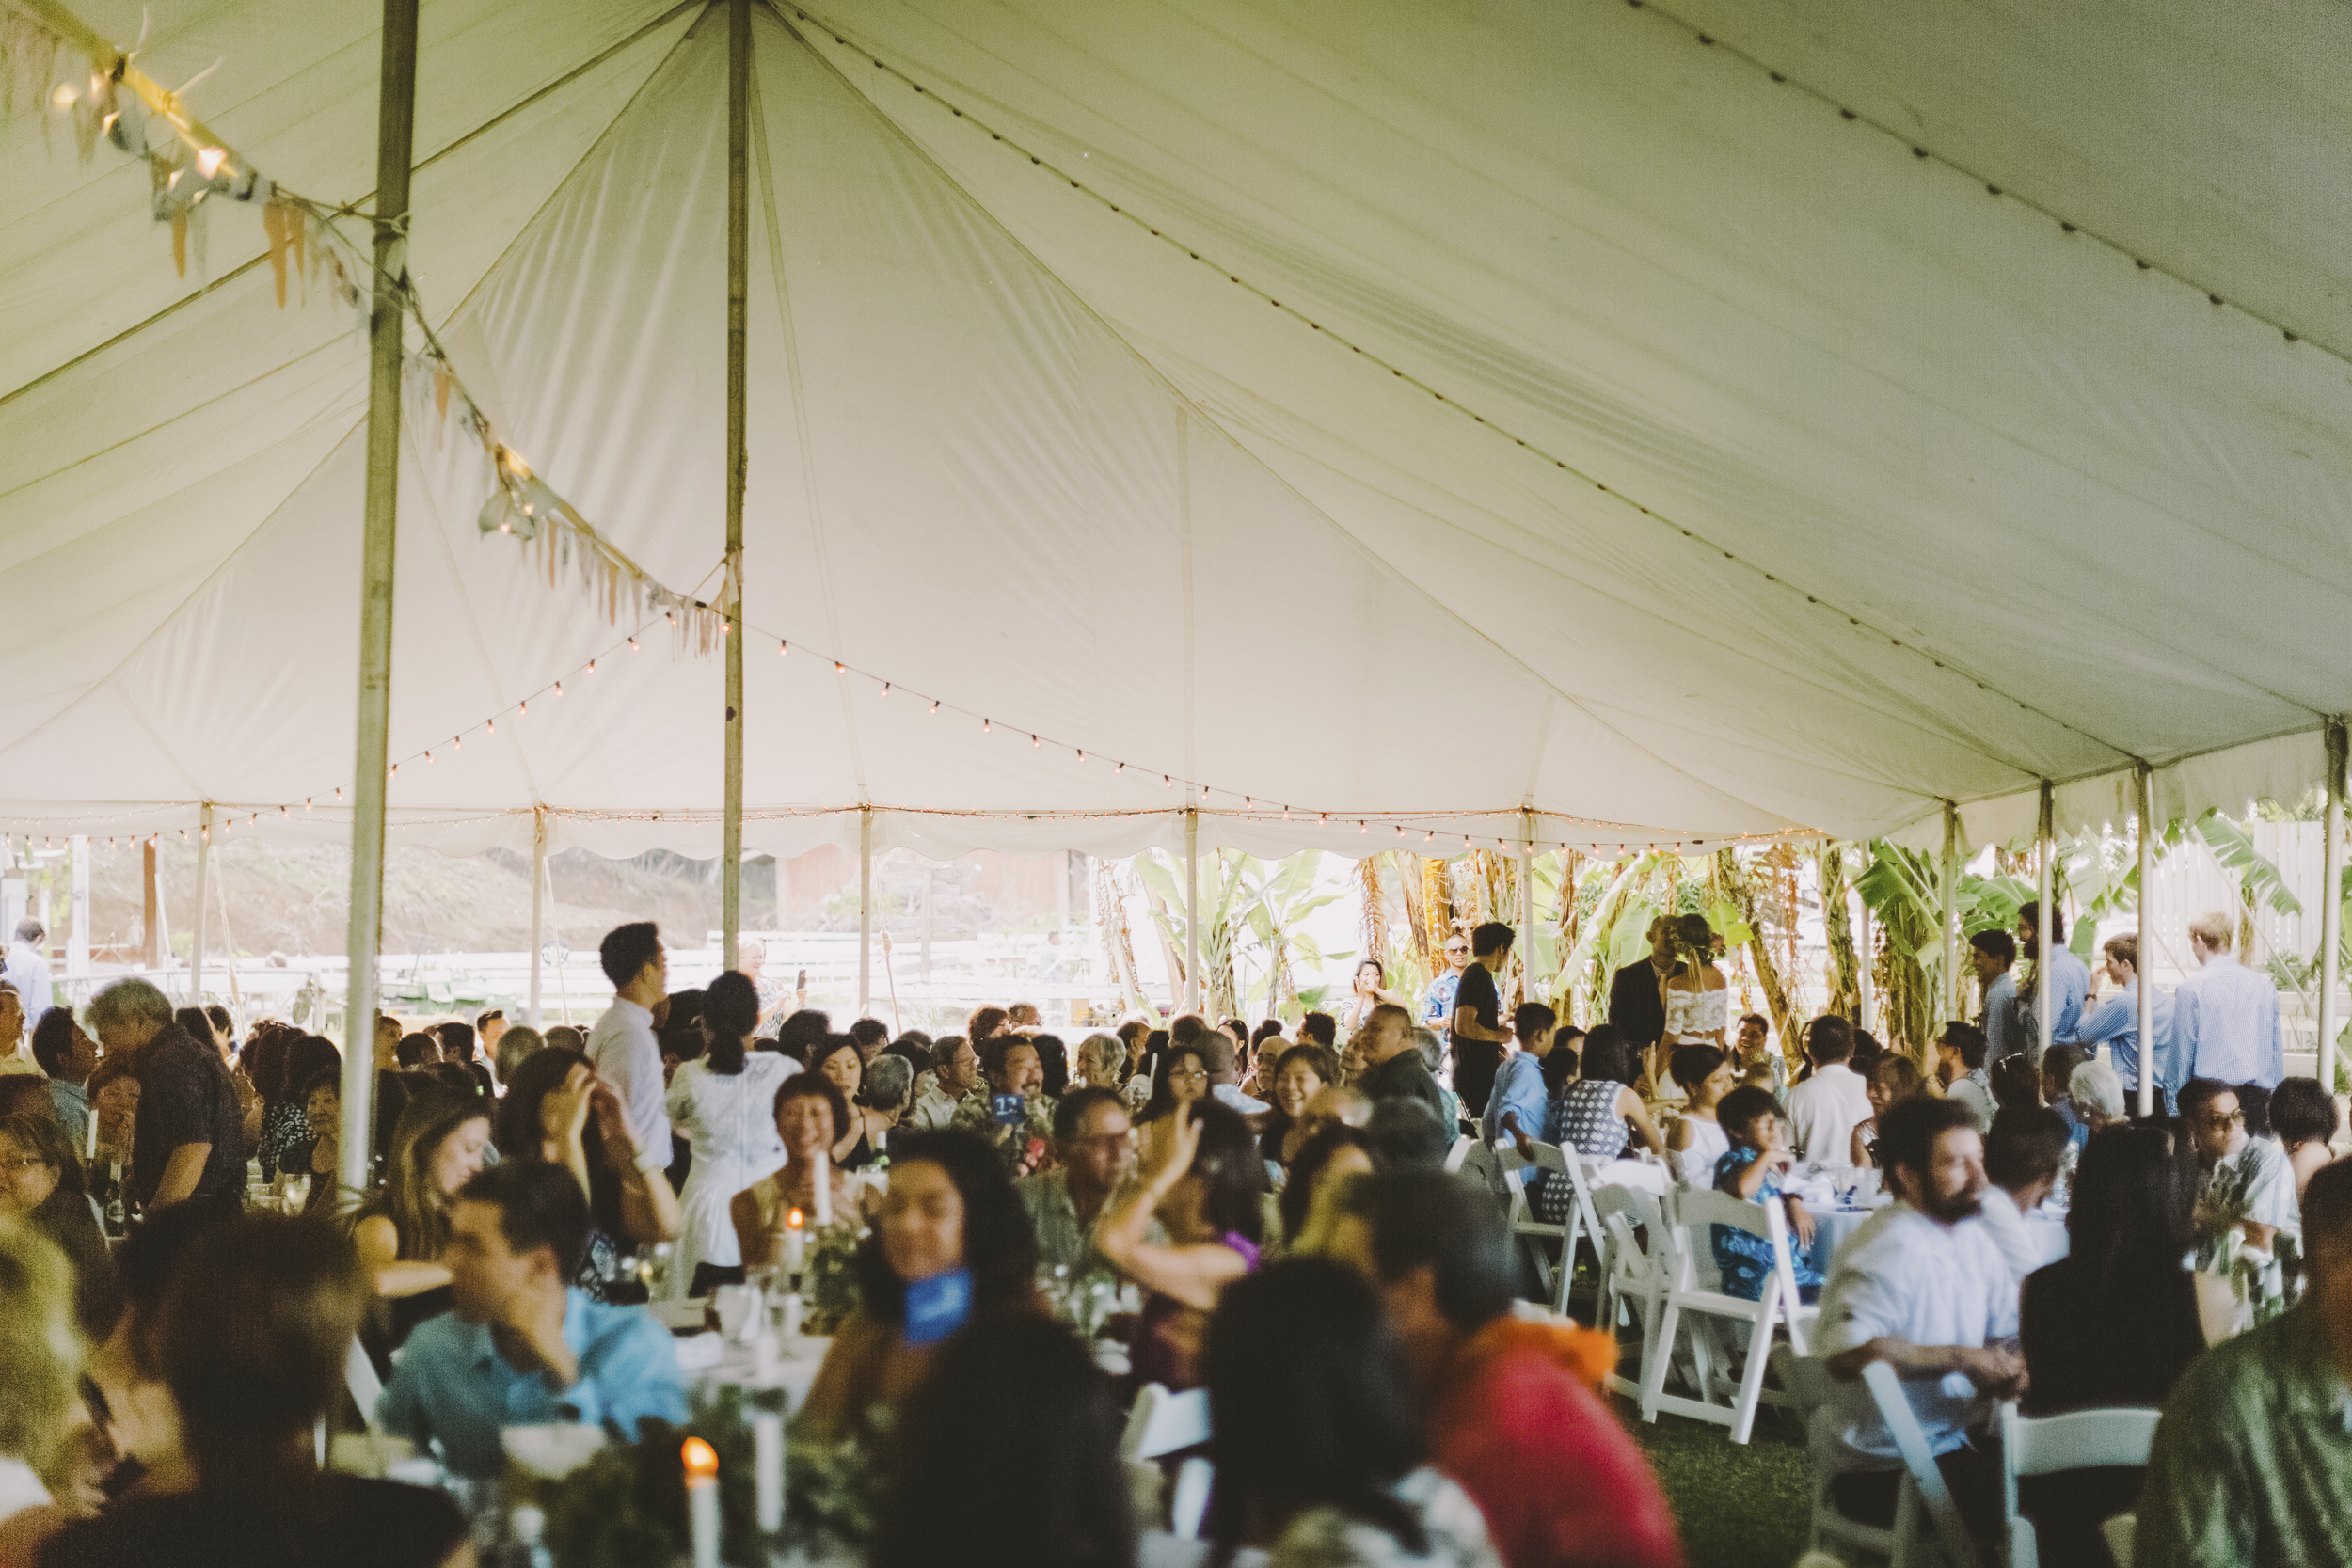 angie-diaz-photography-oahu-hawaii-wedding-tradewinds-ranch-101.jpg